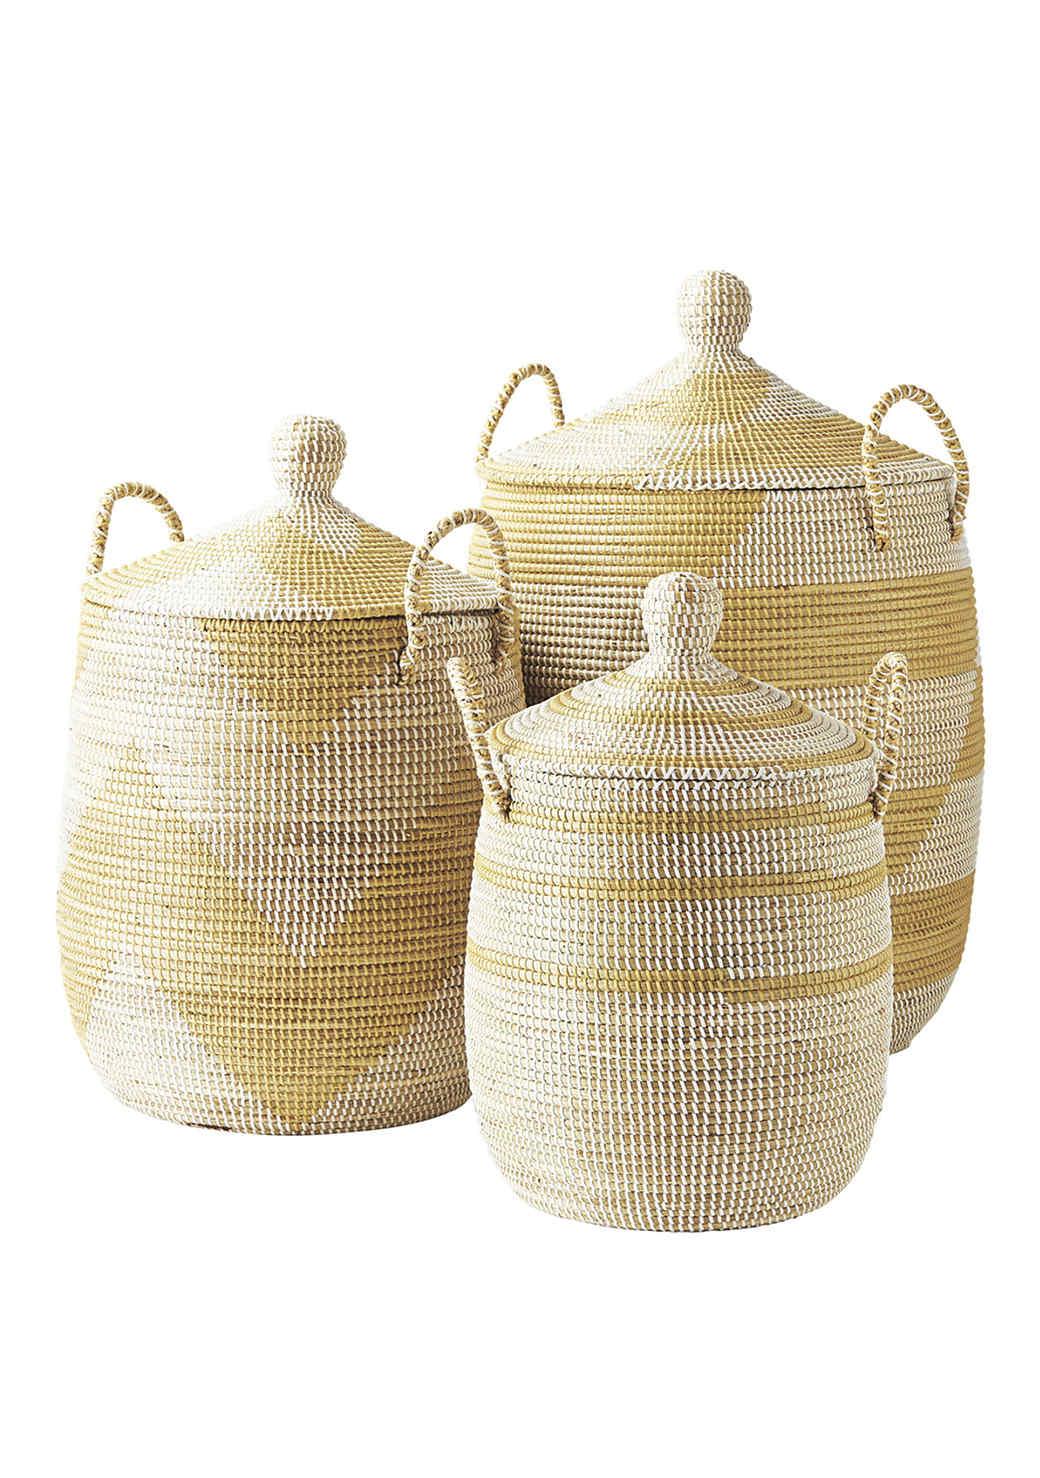 la-jolla-baskets-0116.jpg (skyword:224748)